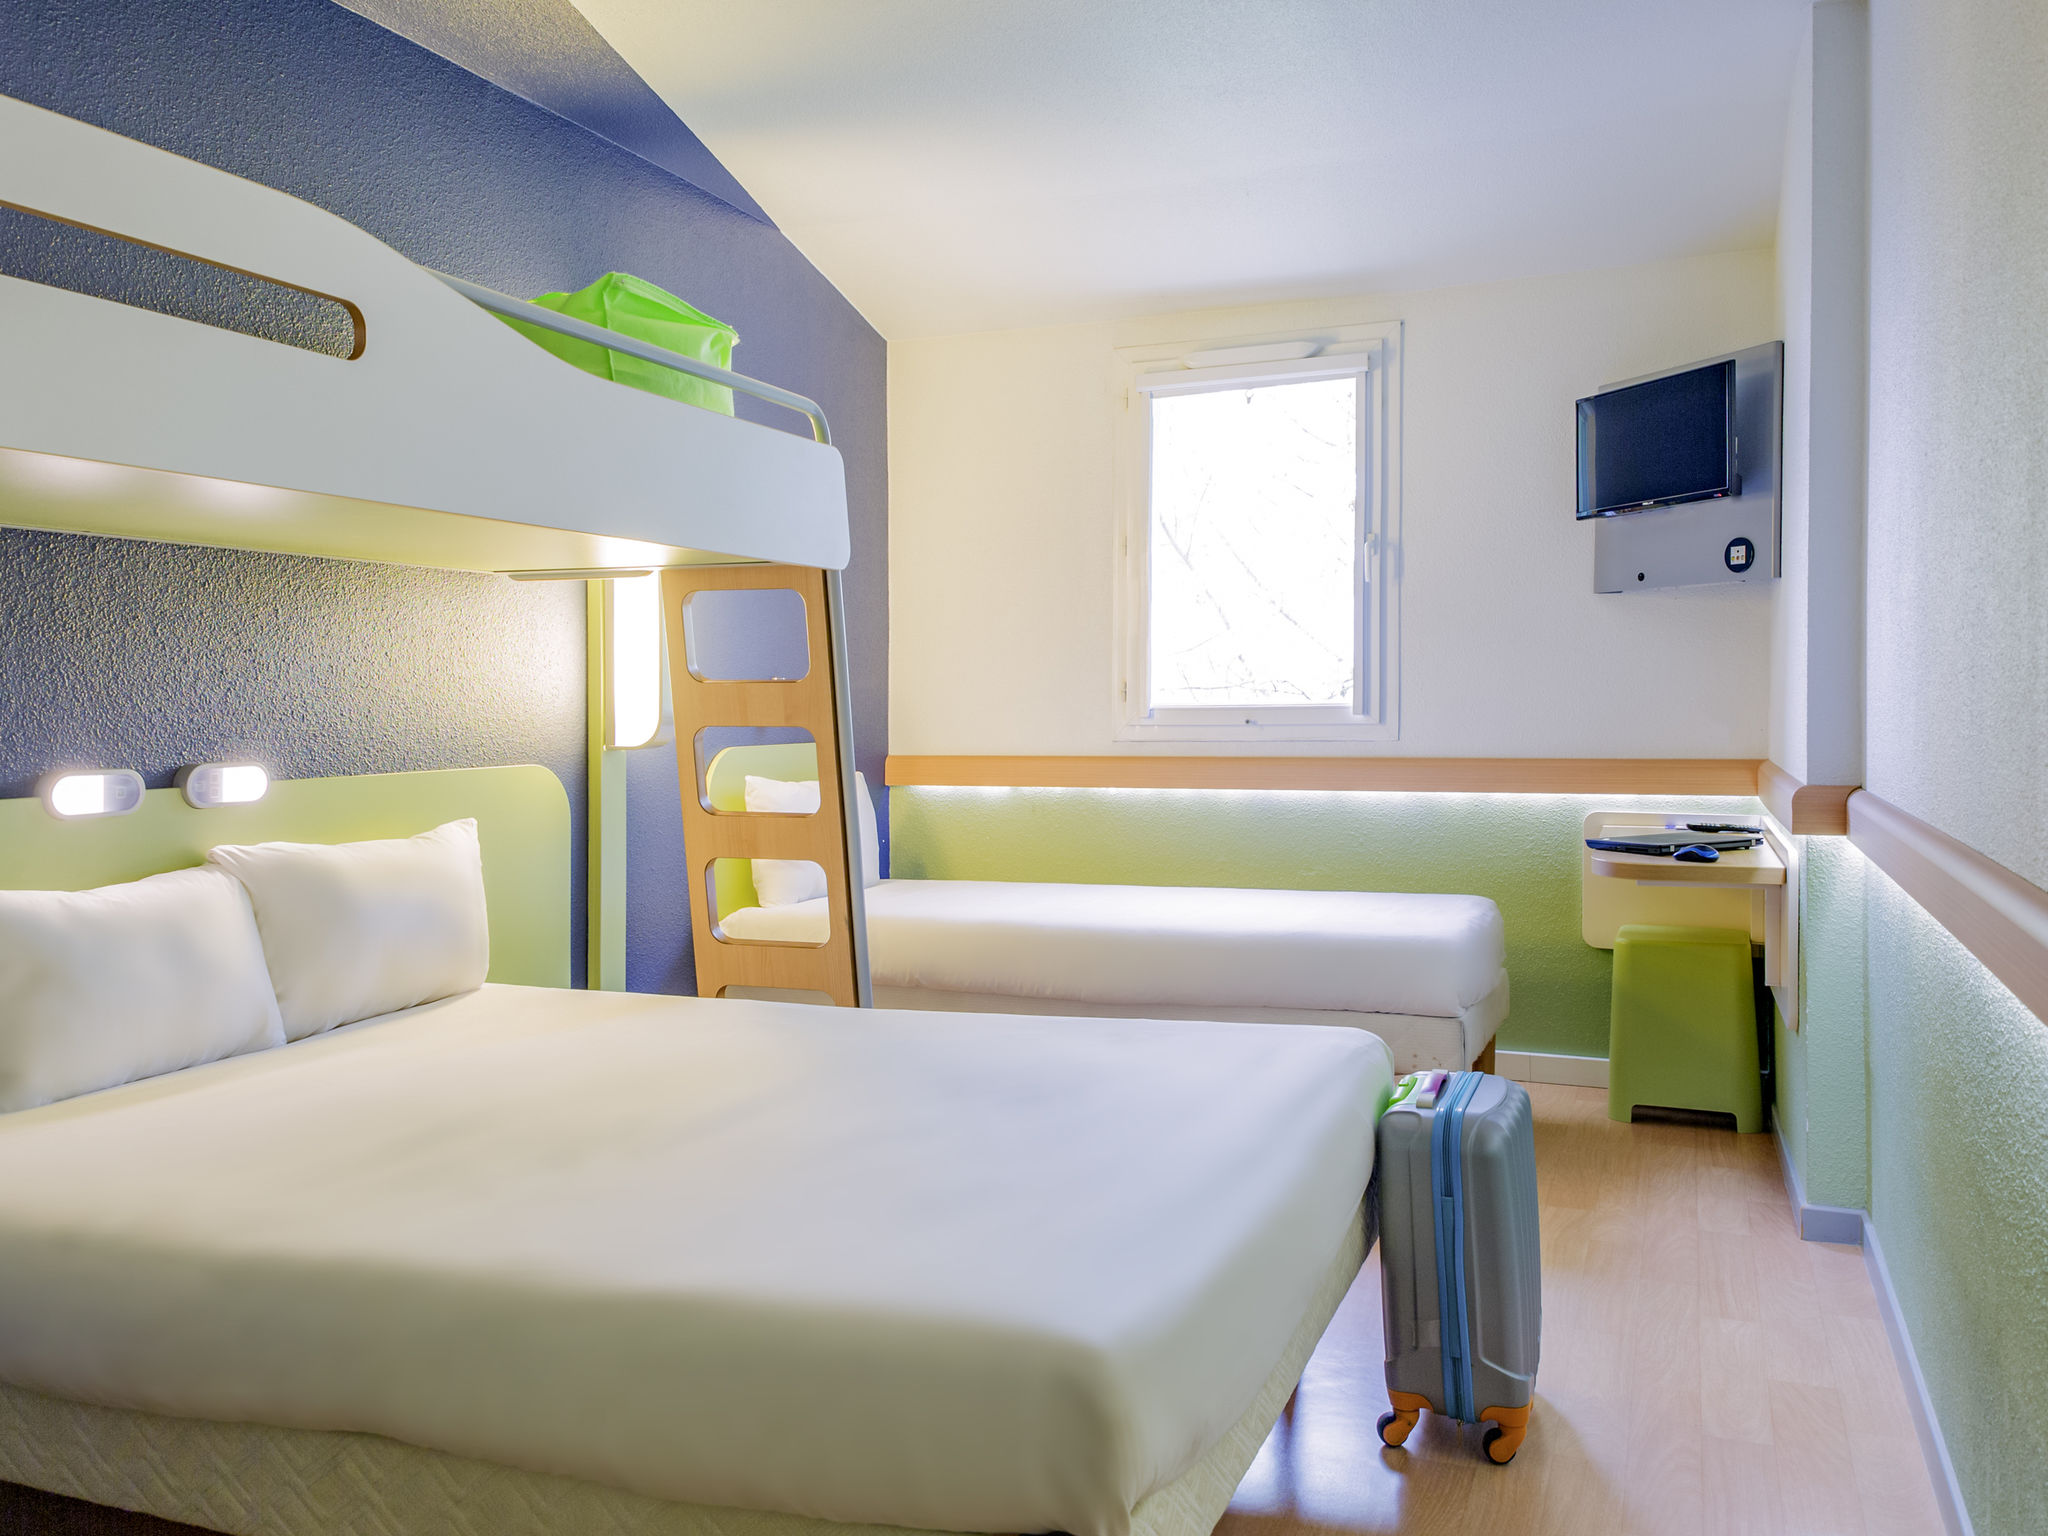 Hotel pas cher SAINT HERBLAIN ibis bud Nantes Nord Saint Herblain